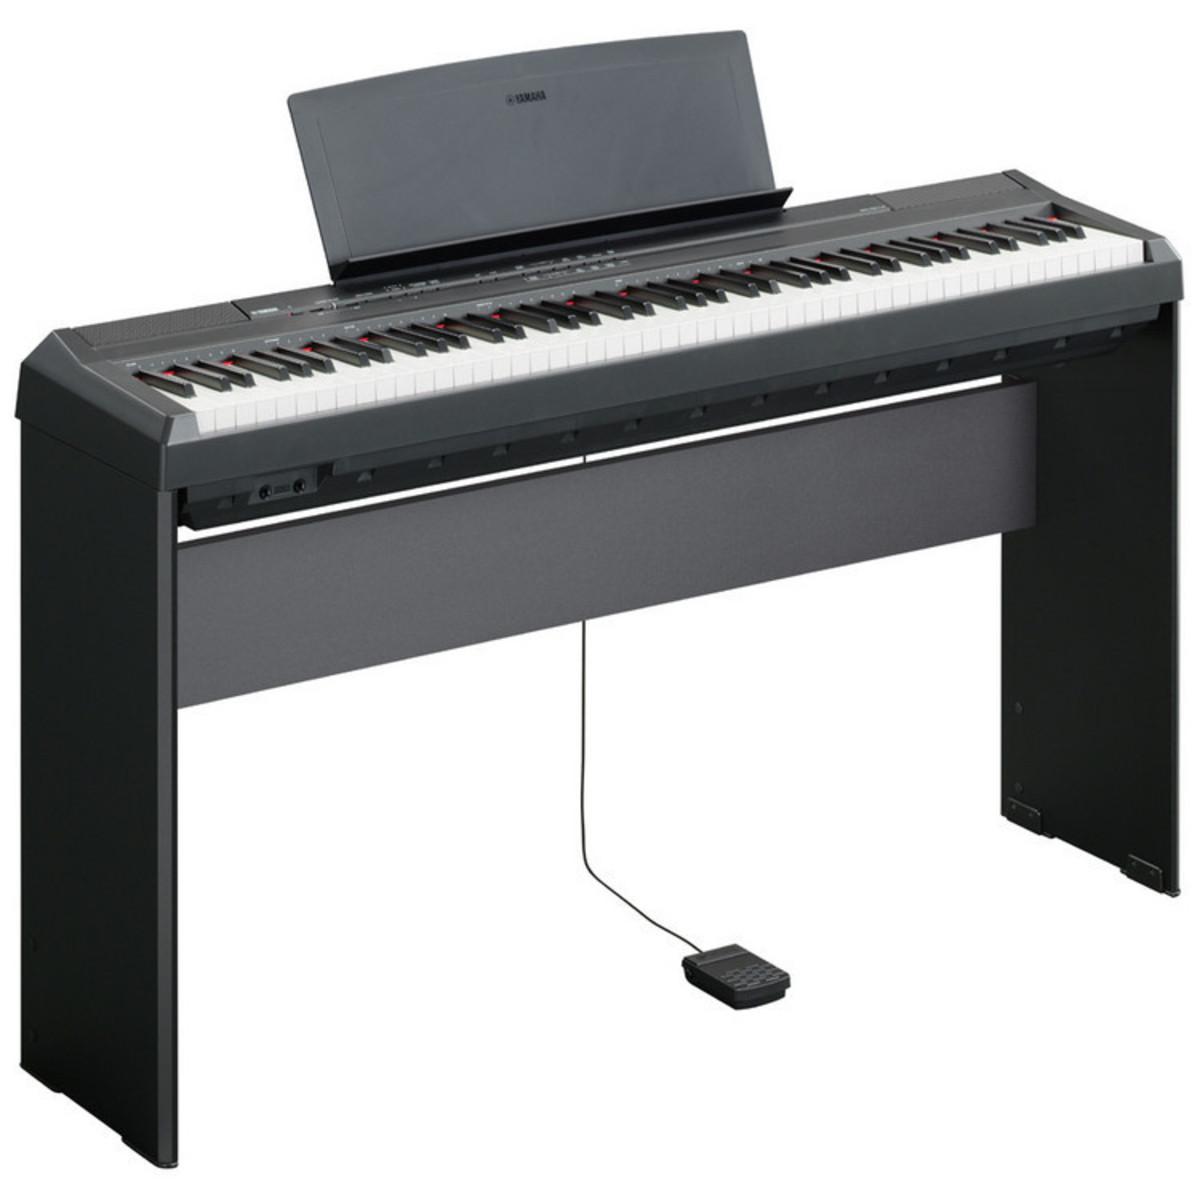 Disc Yamaha P105 Digital Piano Black W Stand Pedal